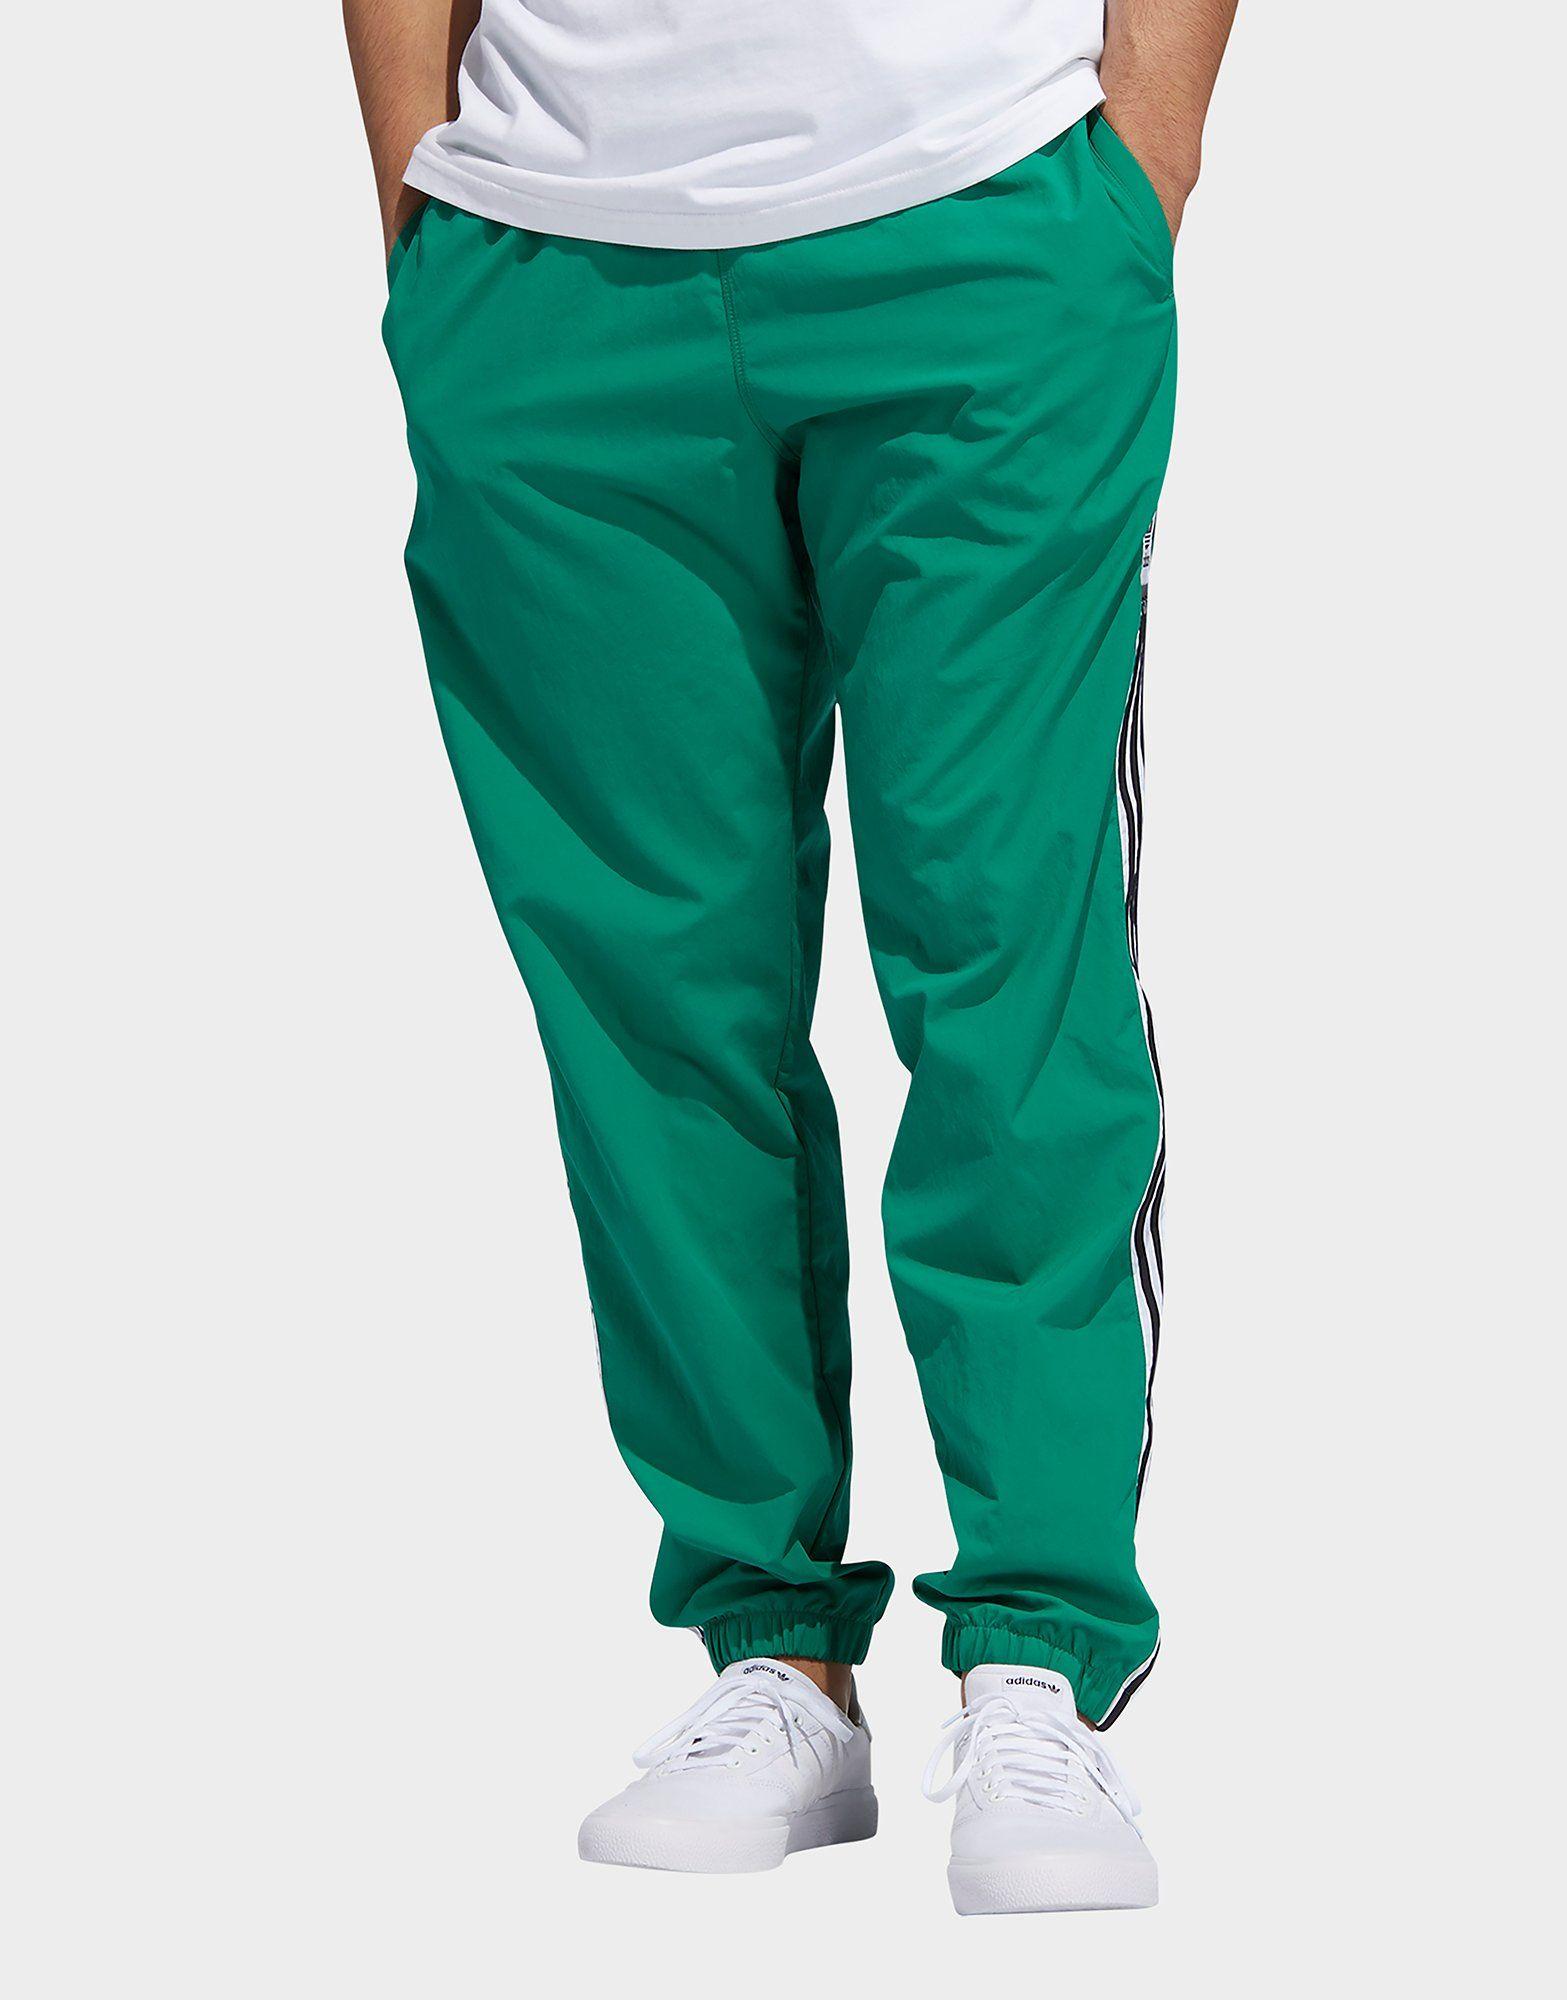 adidas Originals Standard 20 Wind Pants | JD Sports